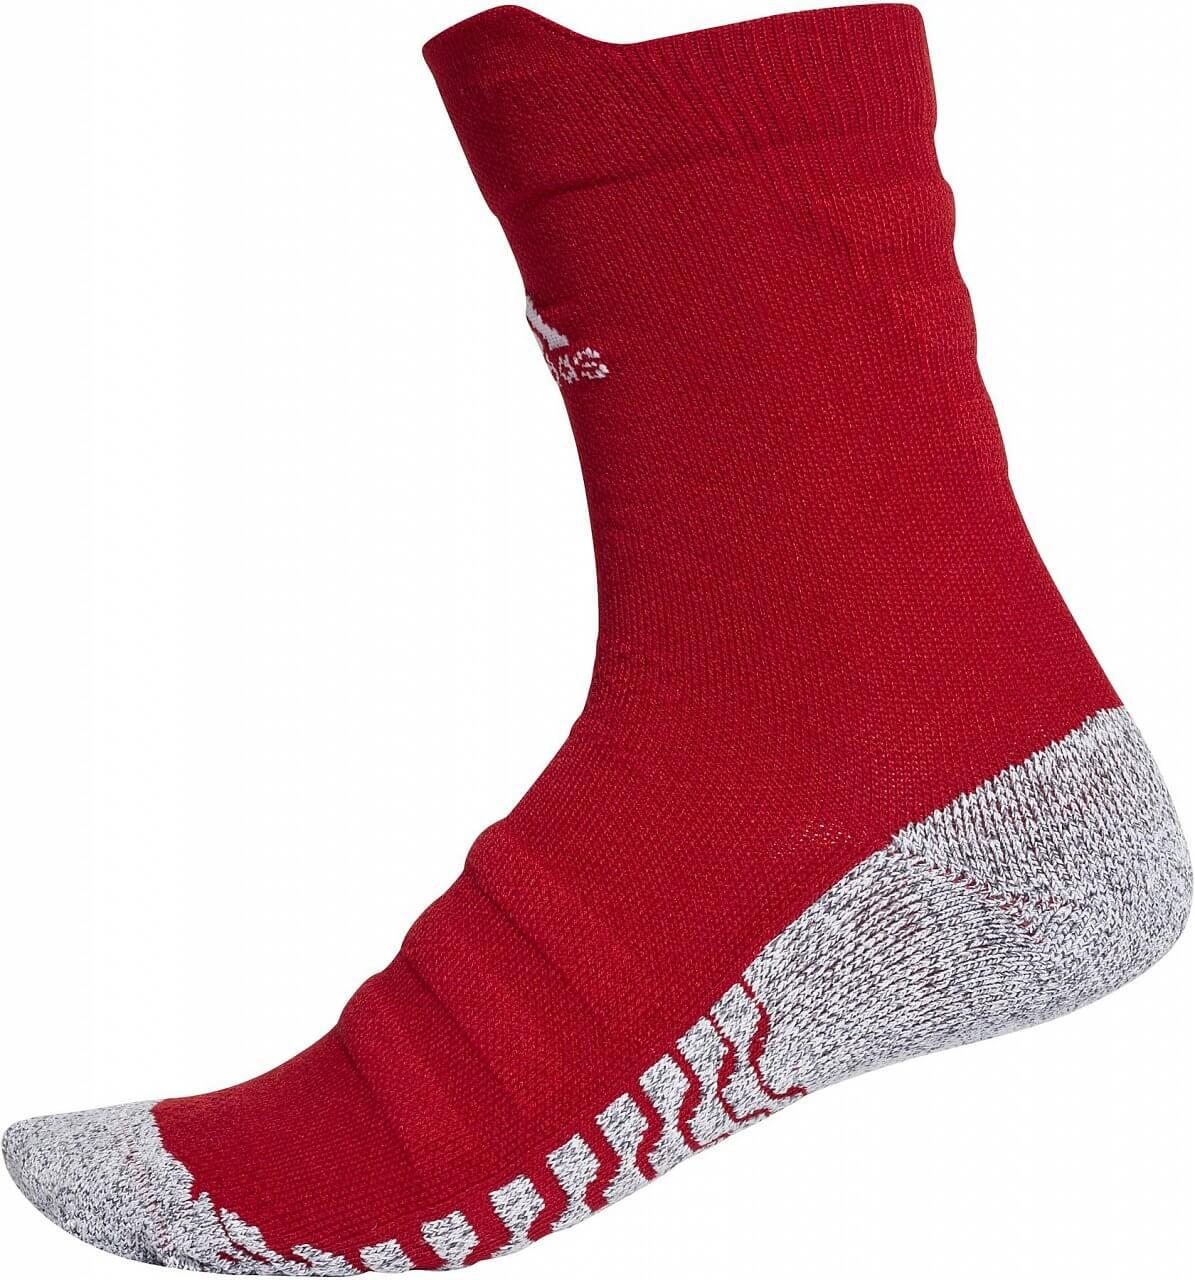 Sportovní ponožky adidas Alphaskin Traxion Crew Lightweight Cushioning